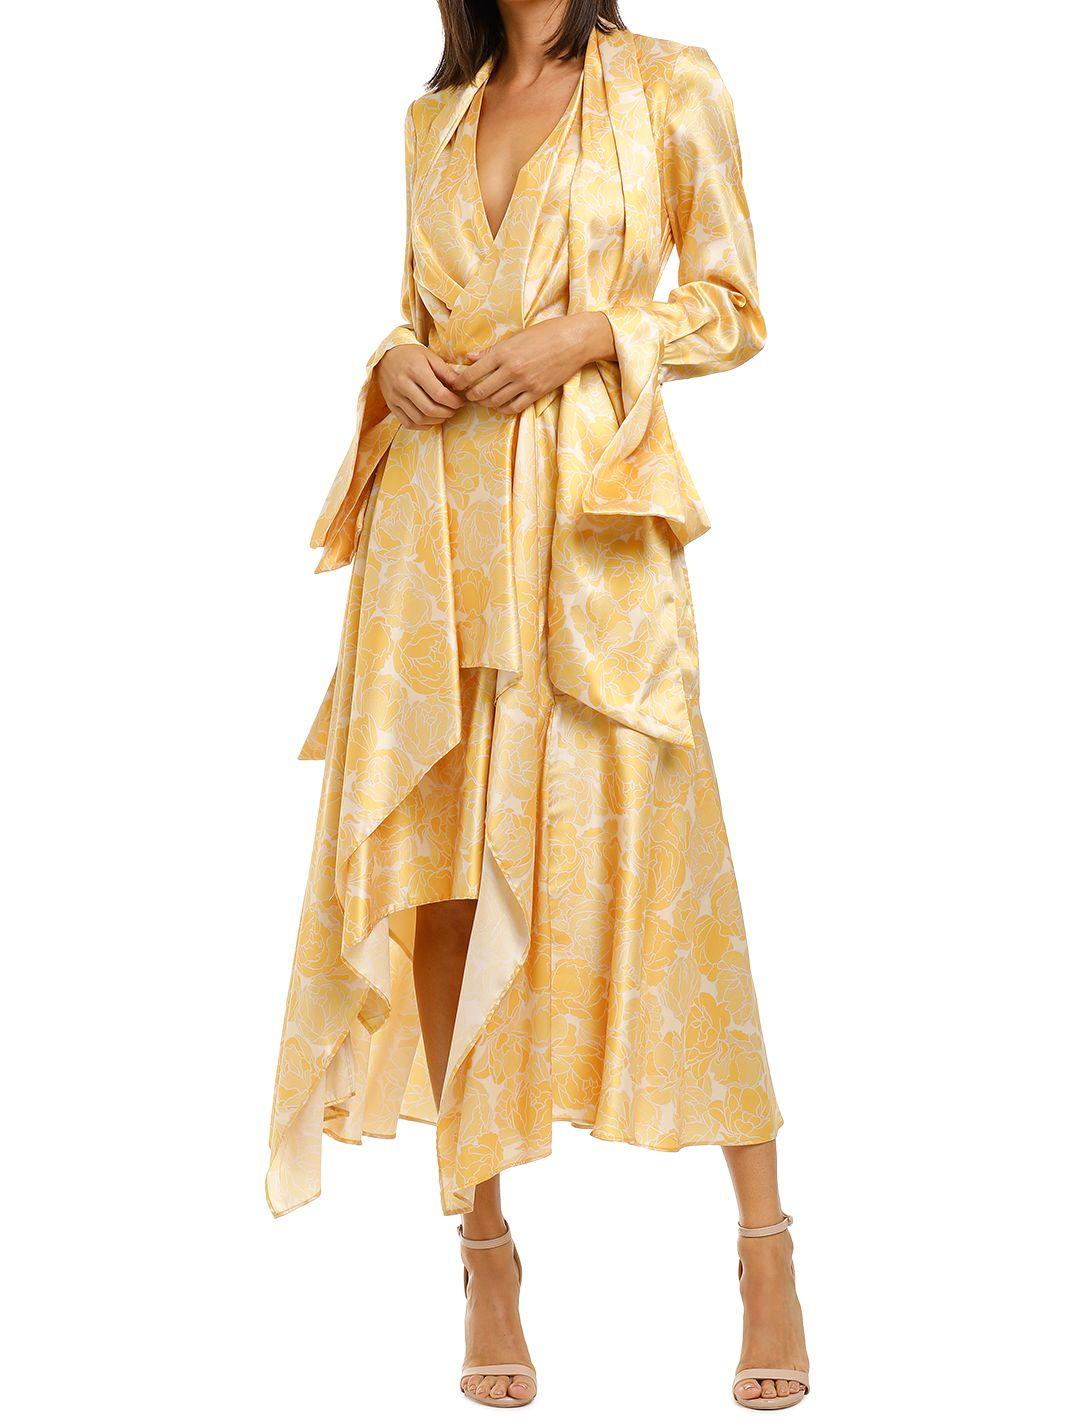 Acler-Wallace-Dress-Lemon-Floral-Front